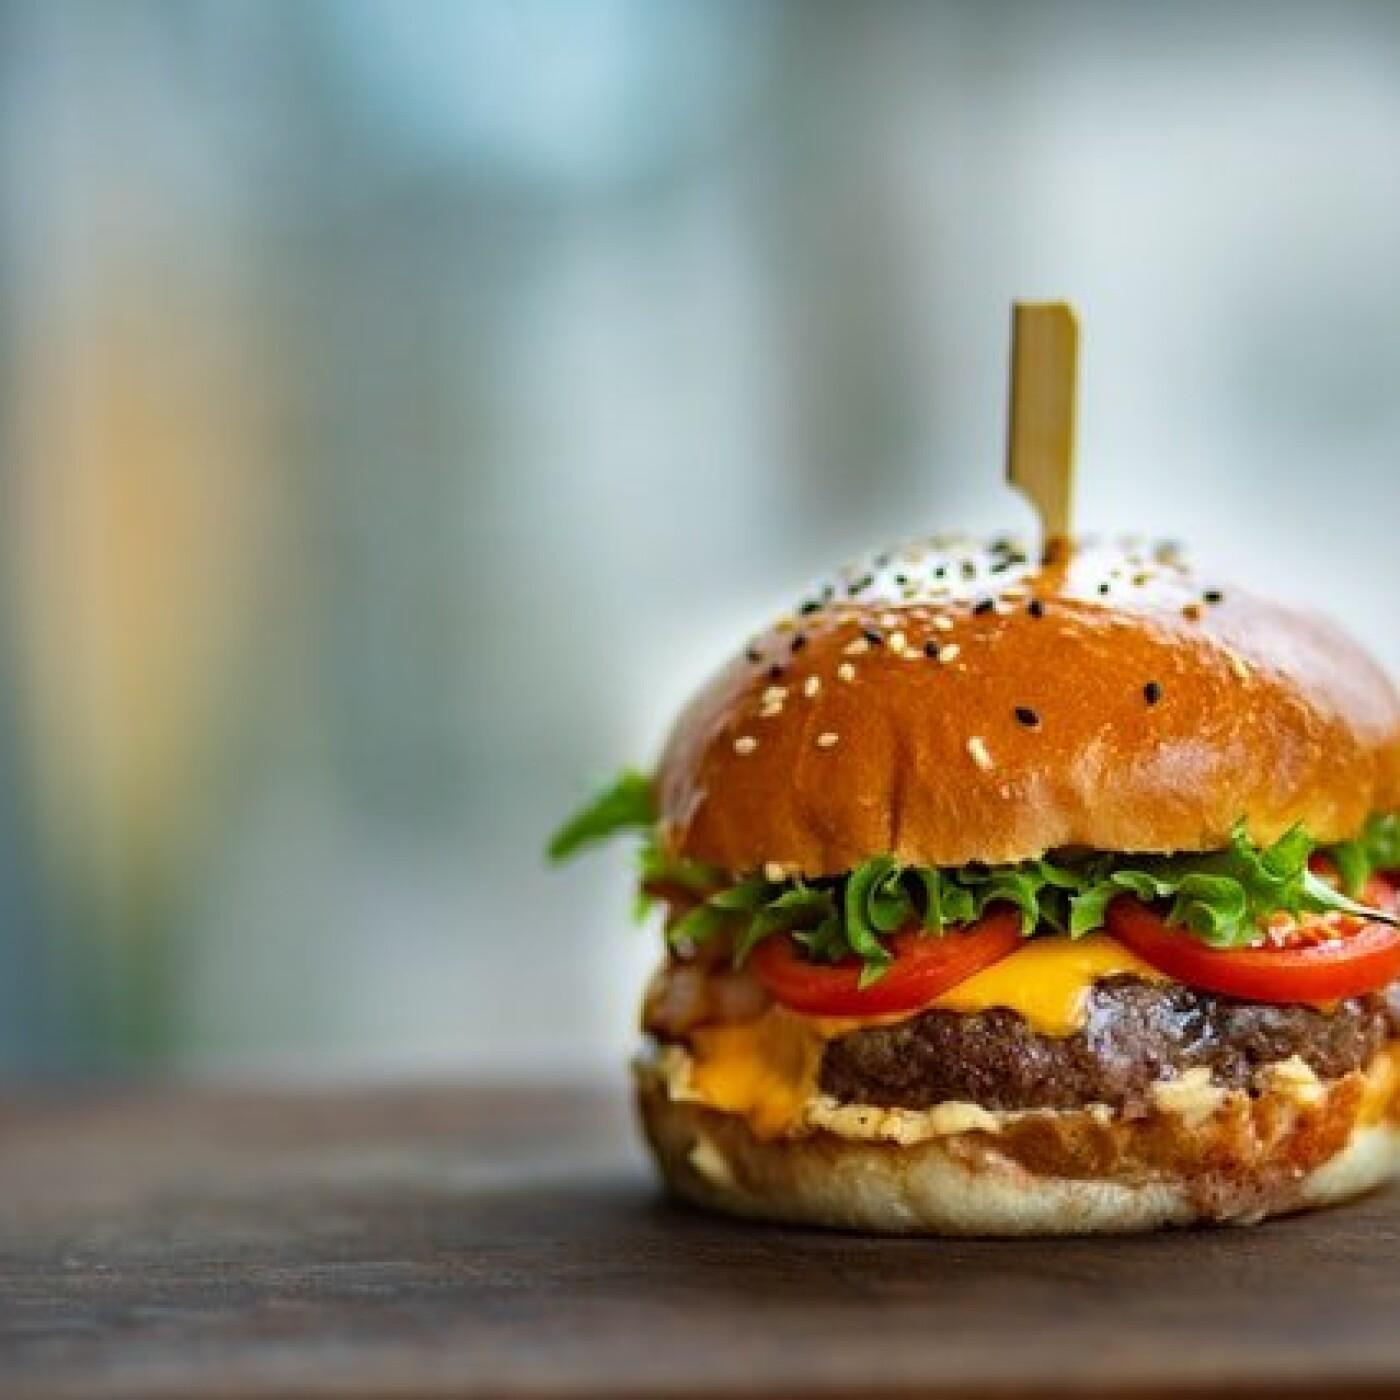 Chiffre du jour, 5000e le burger - 21 07 2021 - StereoChic Radio